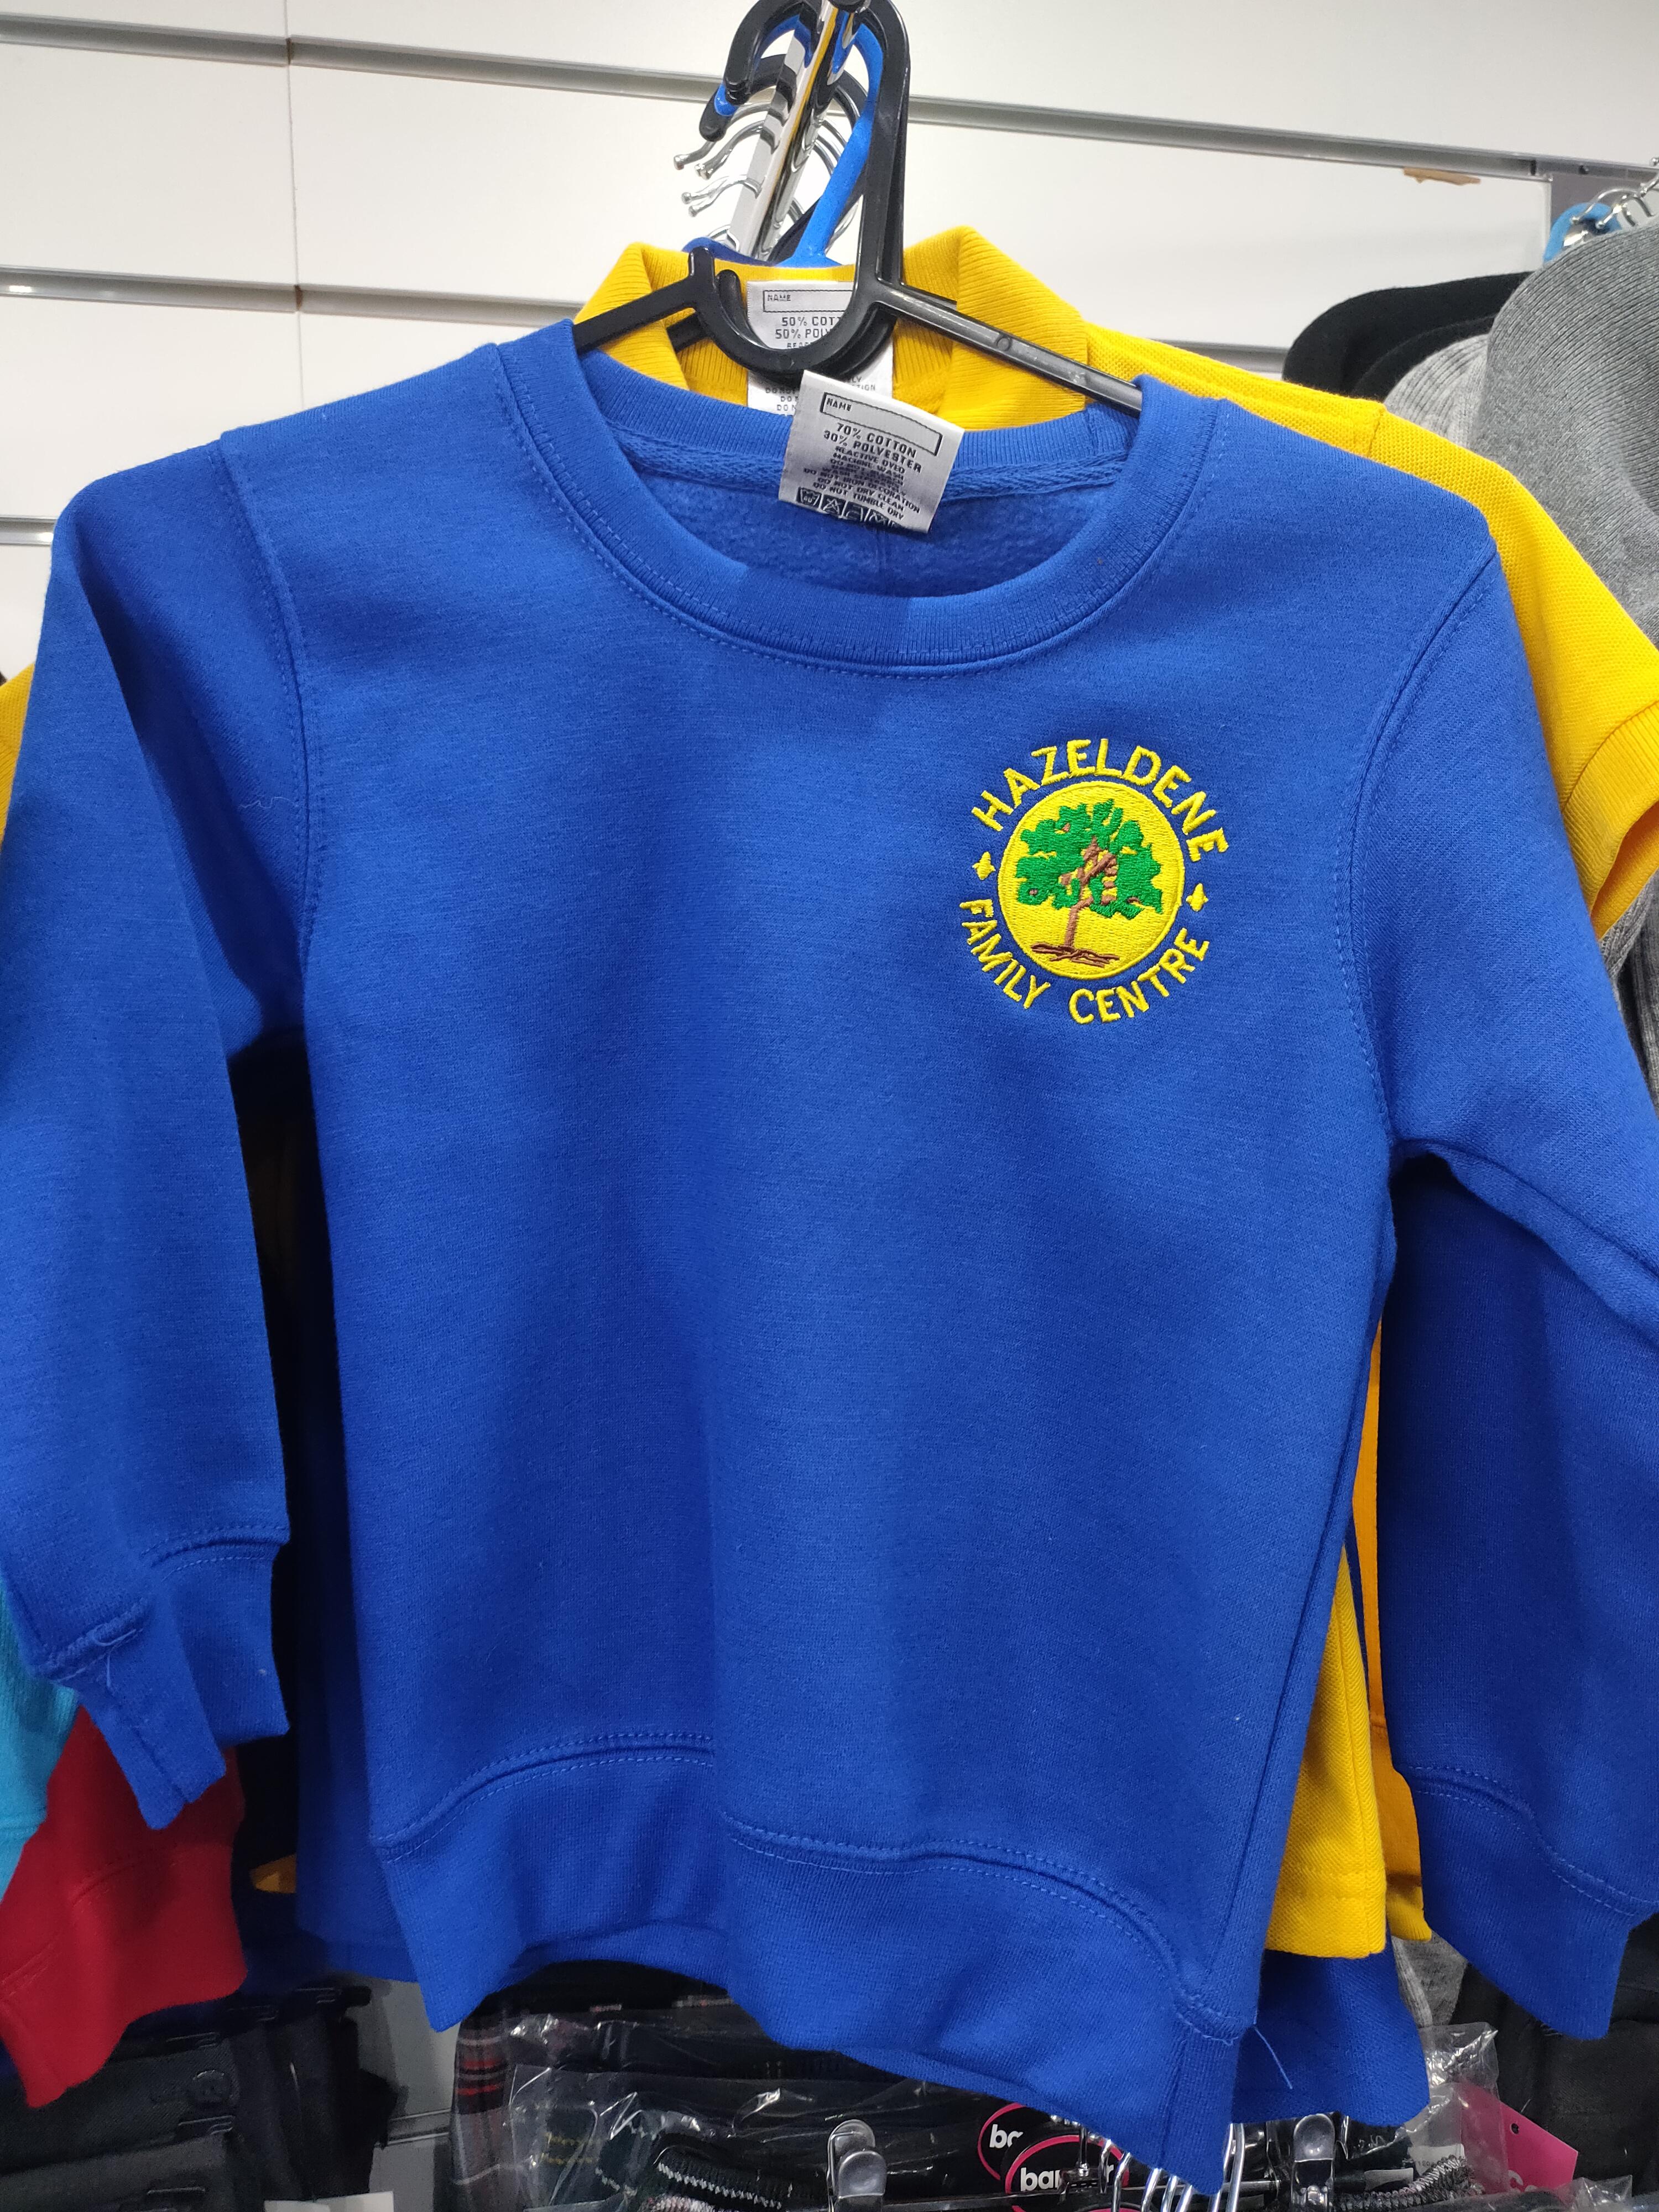 Hazeldene Family Centre Round Neck Sweatshirt (Royal Blue)